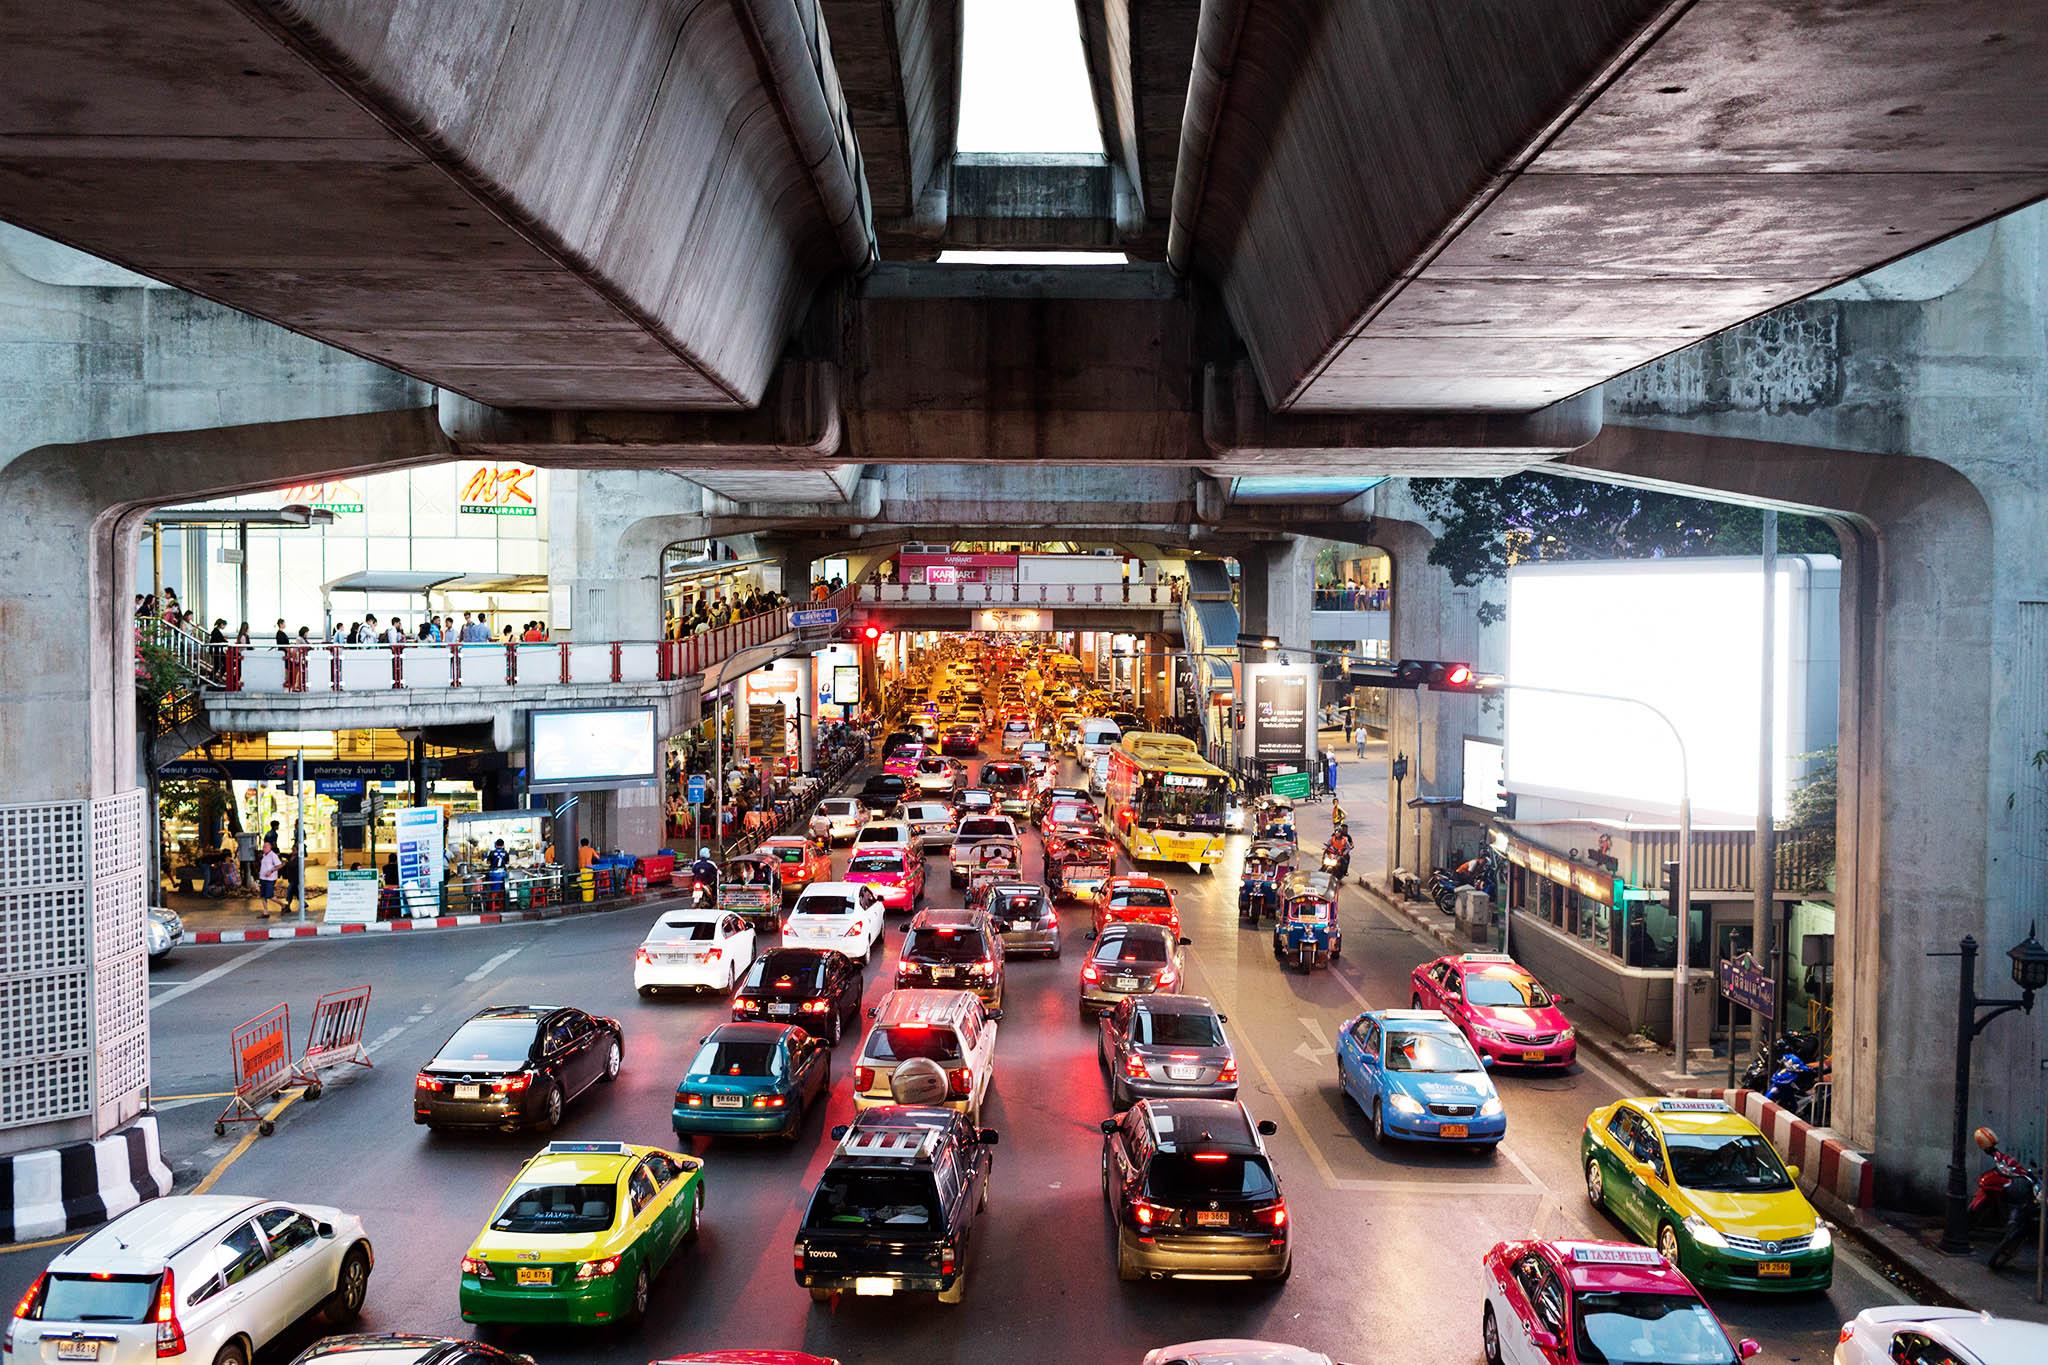 O caos no transito